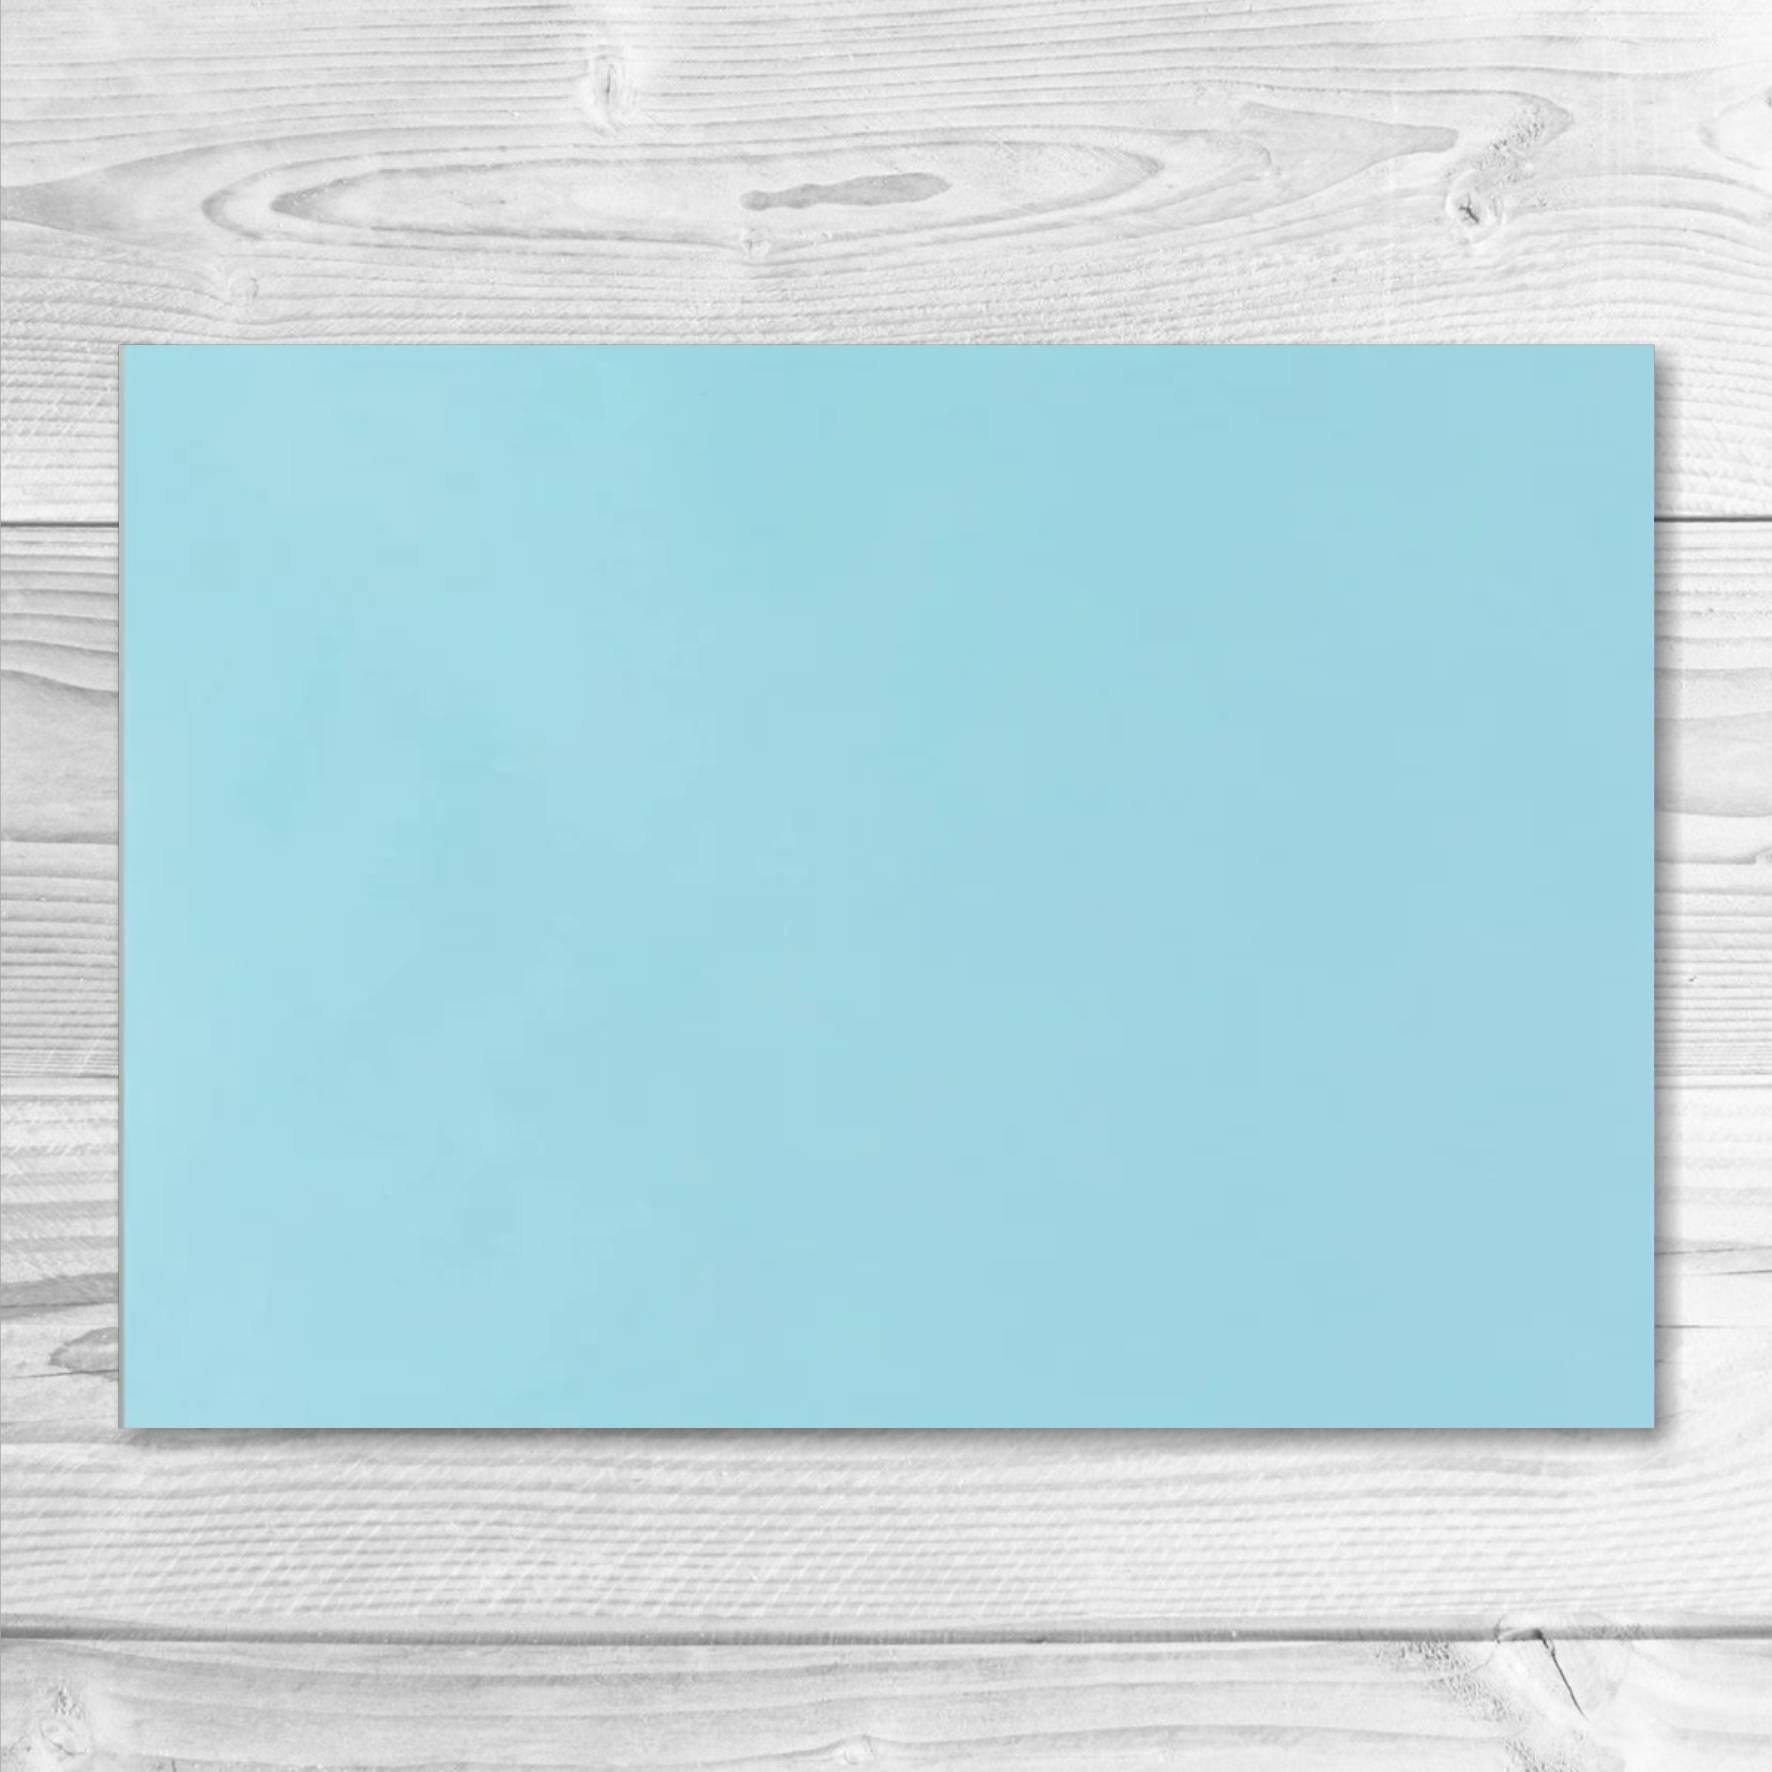 133 x 184 bleu 2